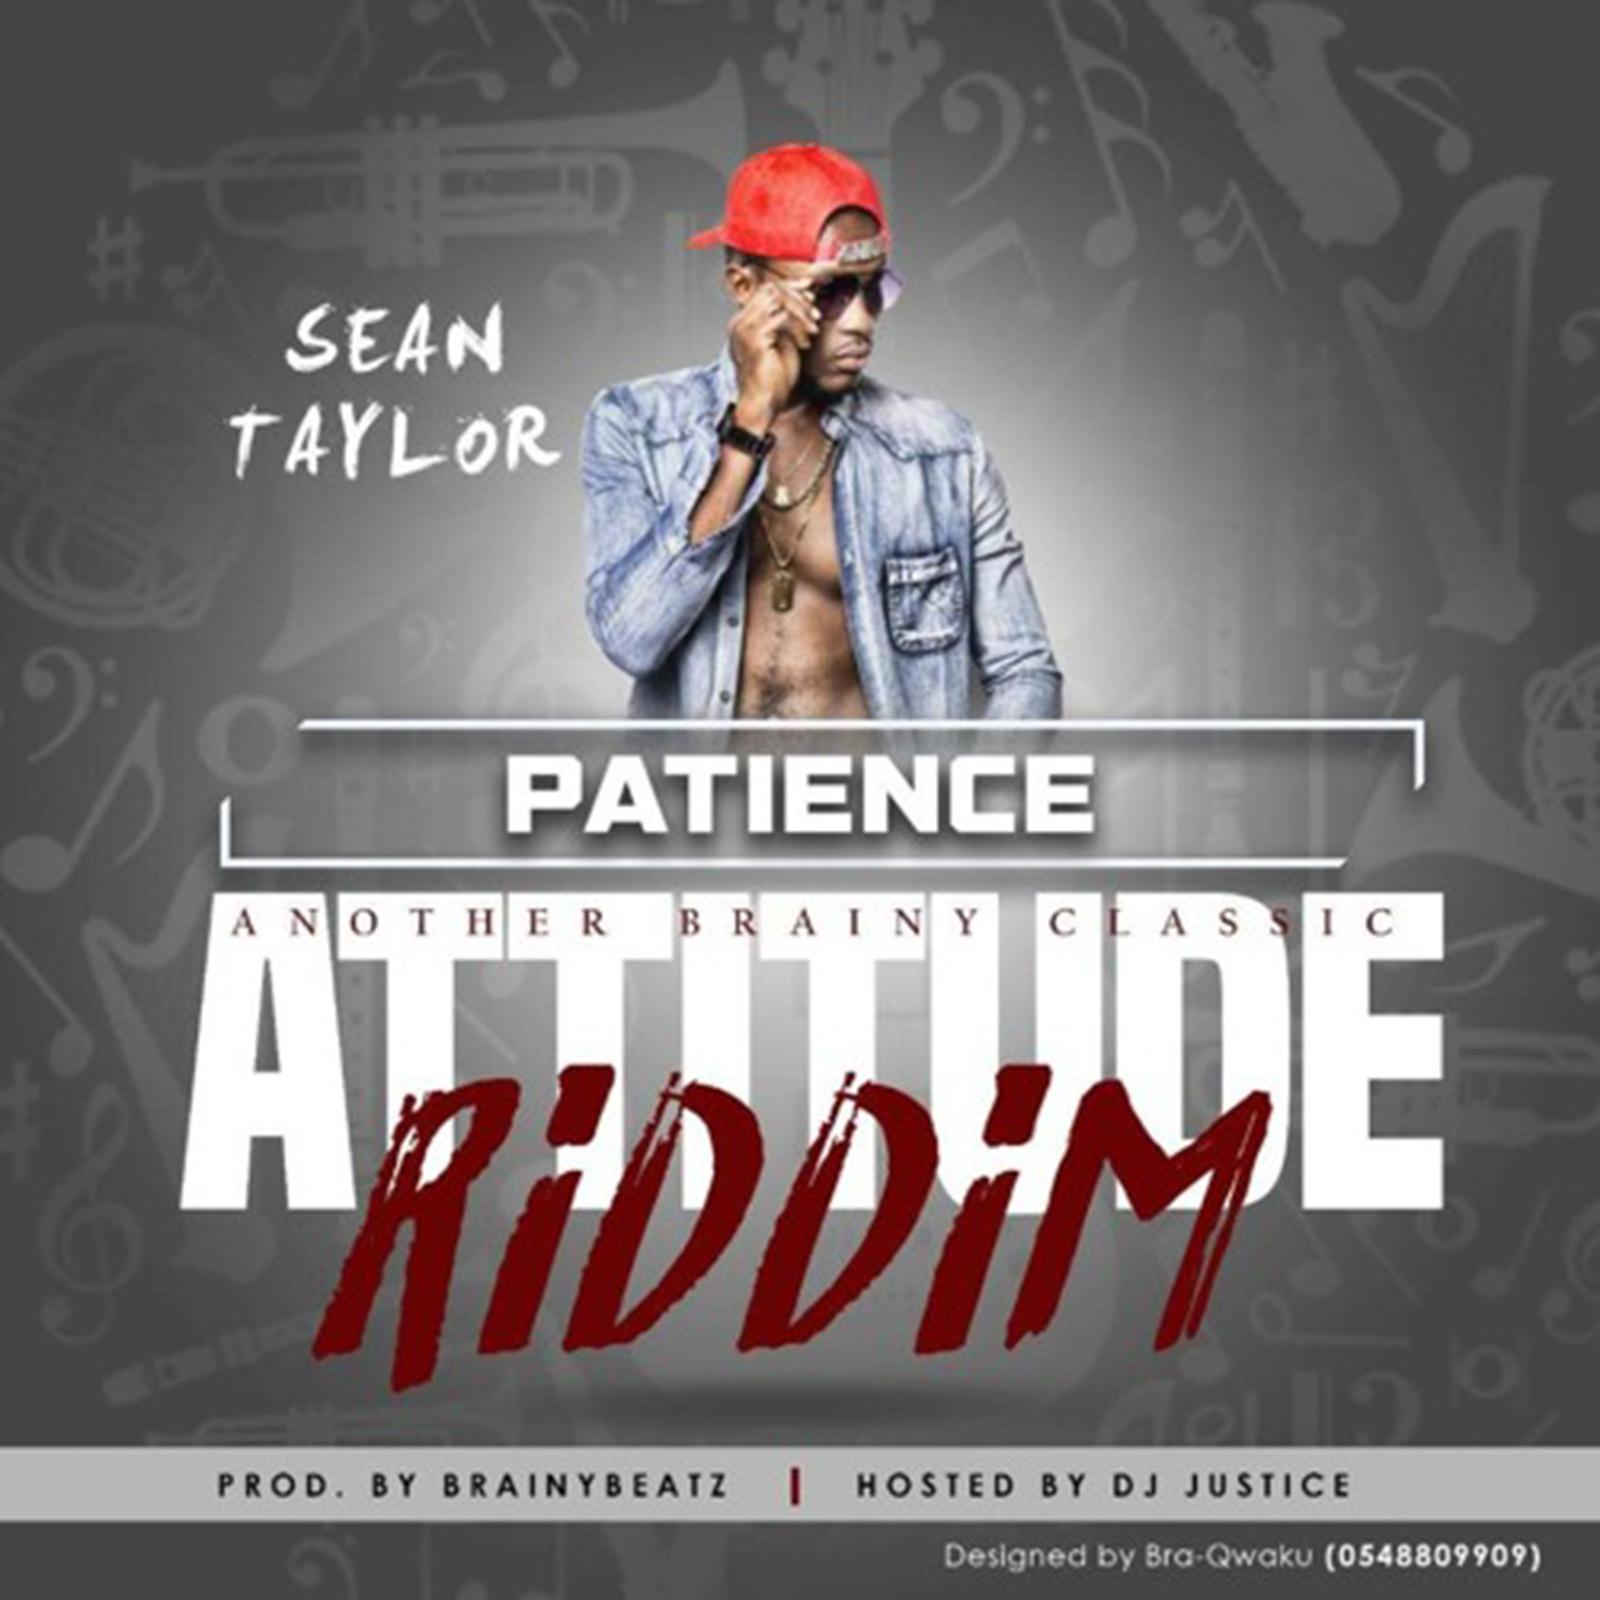 Patience (Attitude Riddim) by Sean Taylor